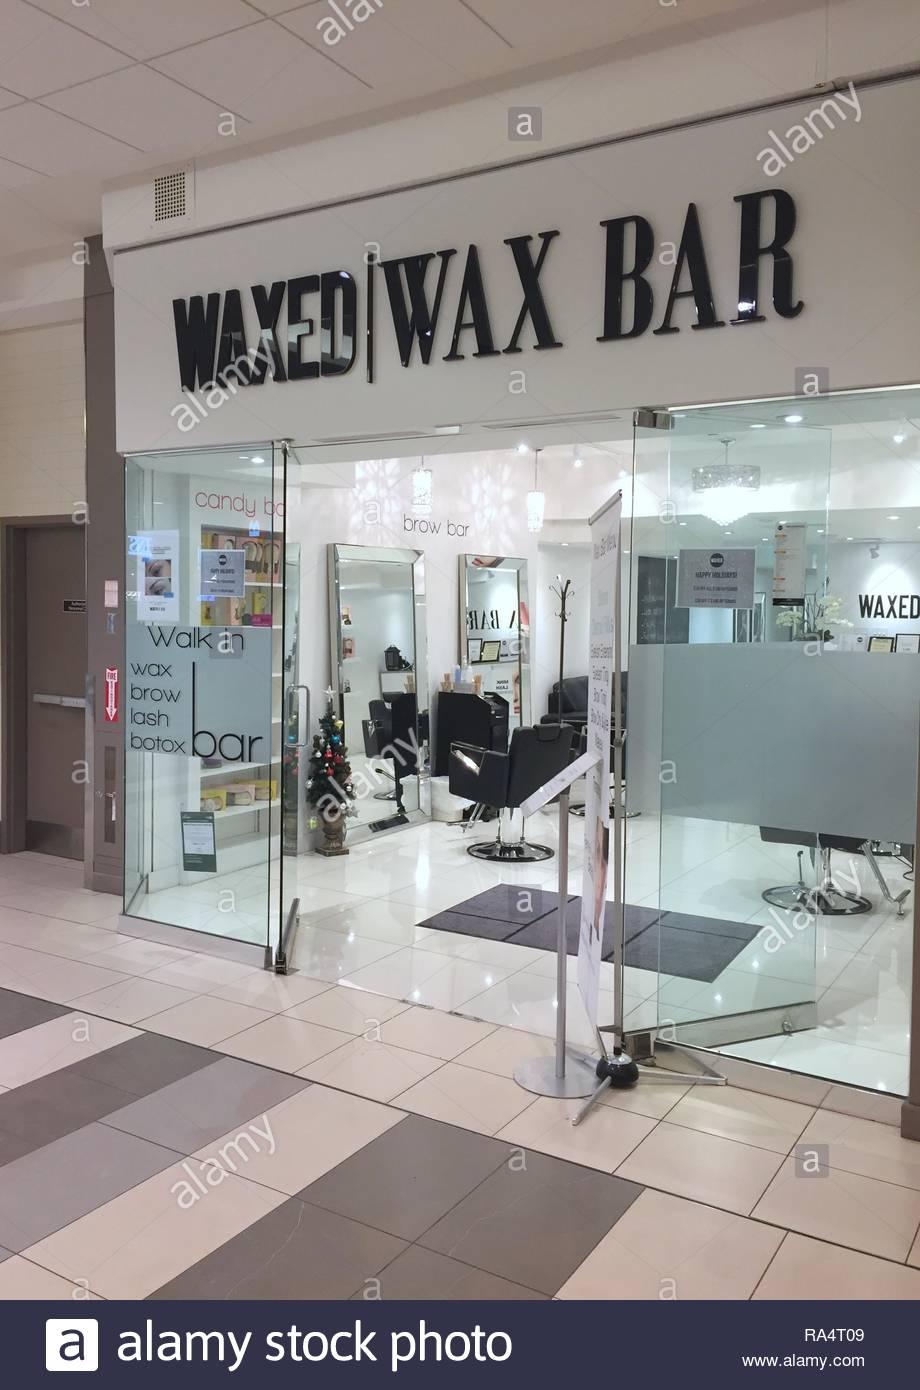 Body waxing salon in Toronto, Ontario, Canada - Stock Image